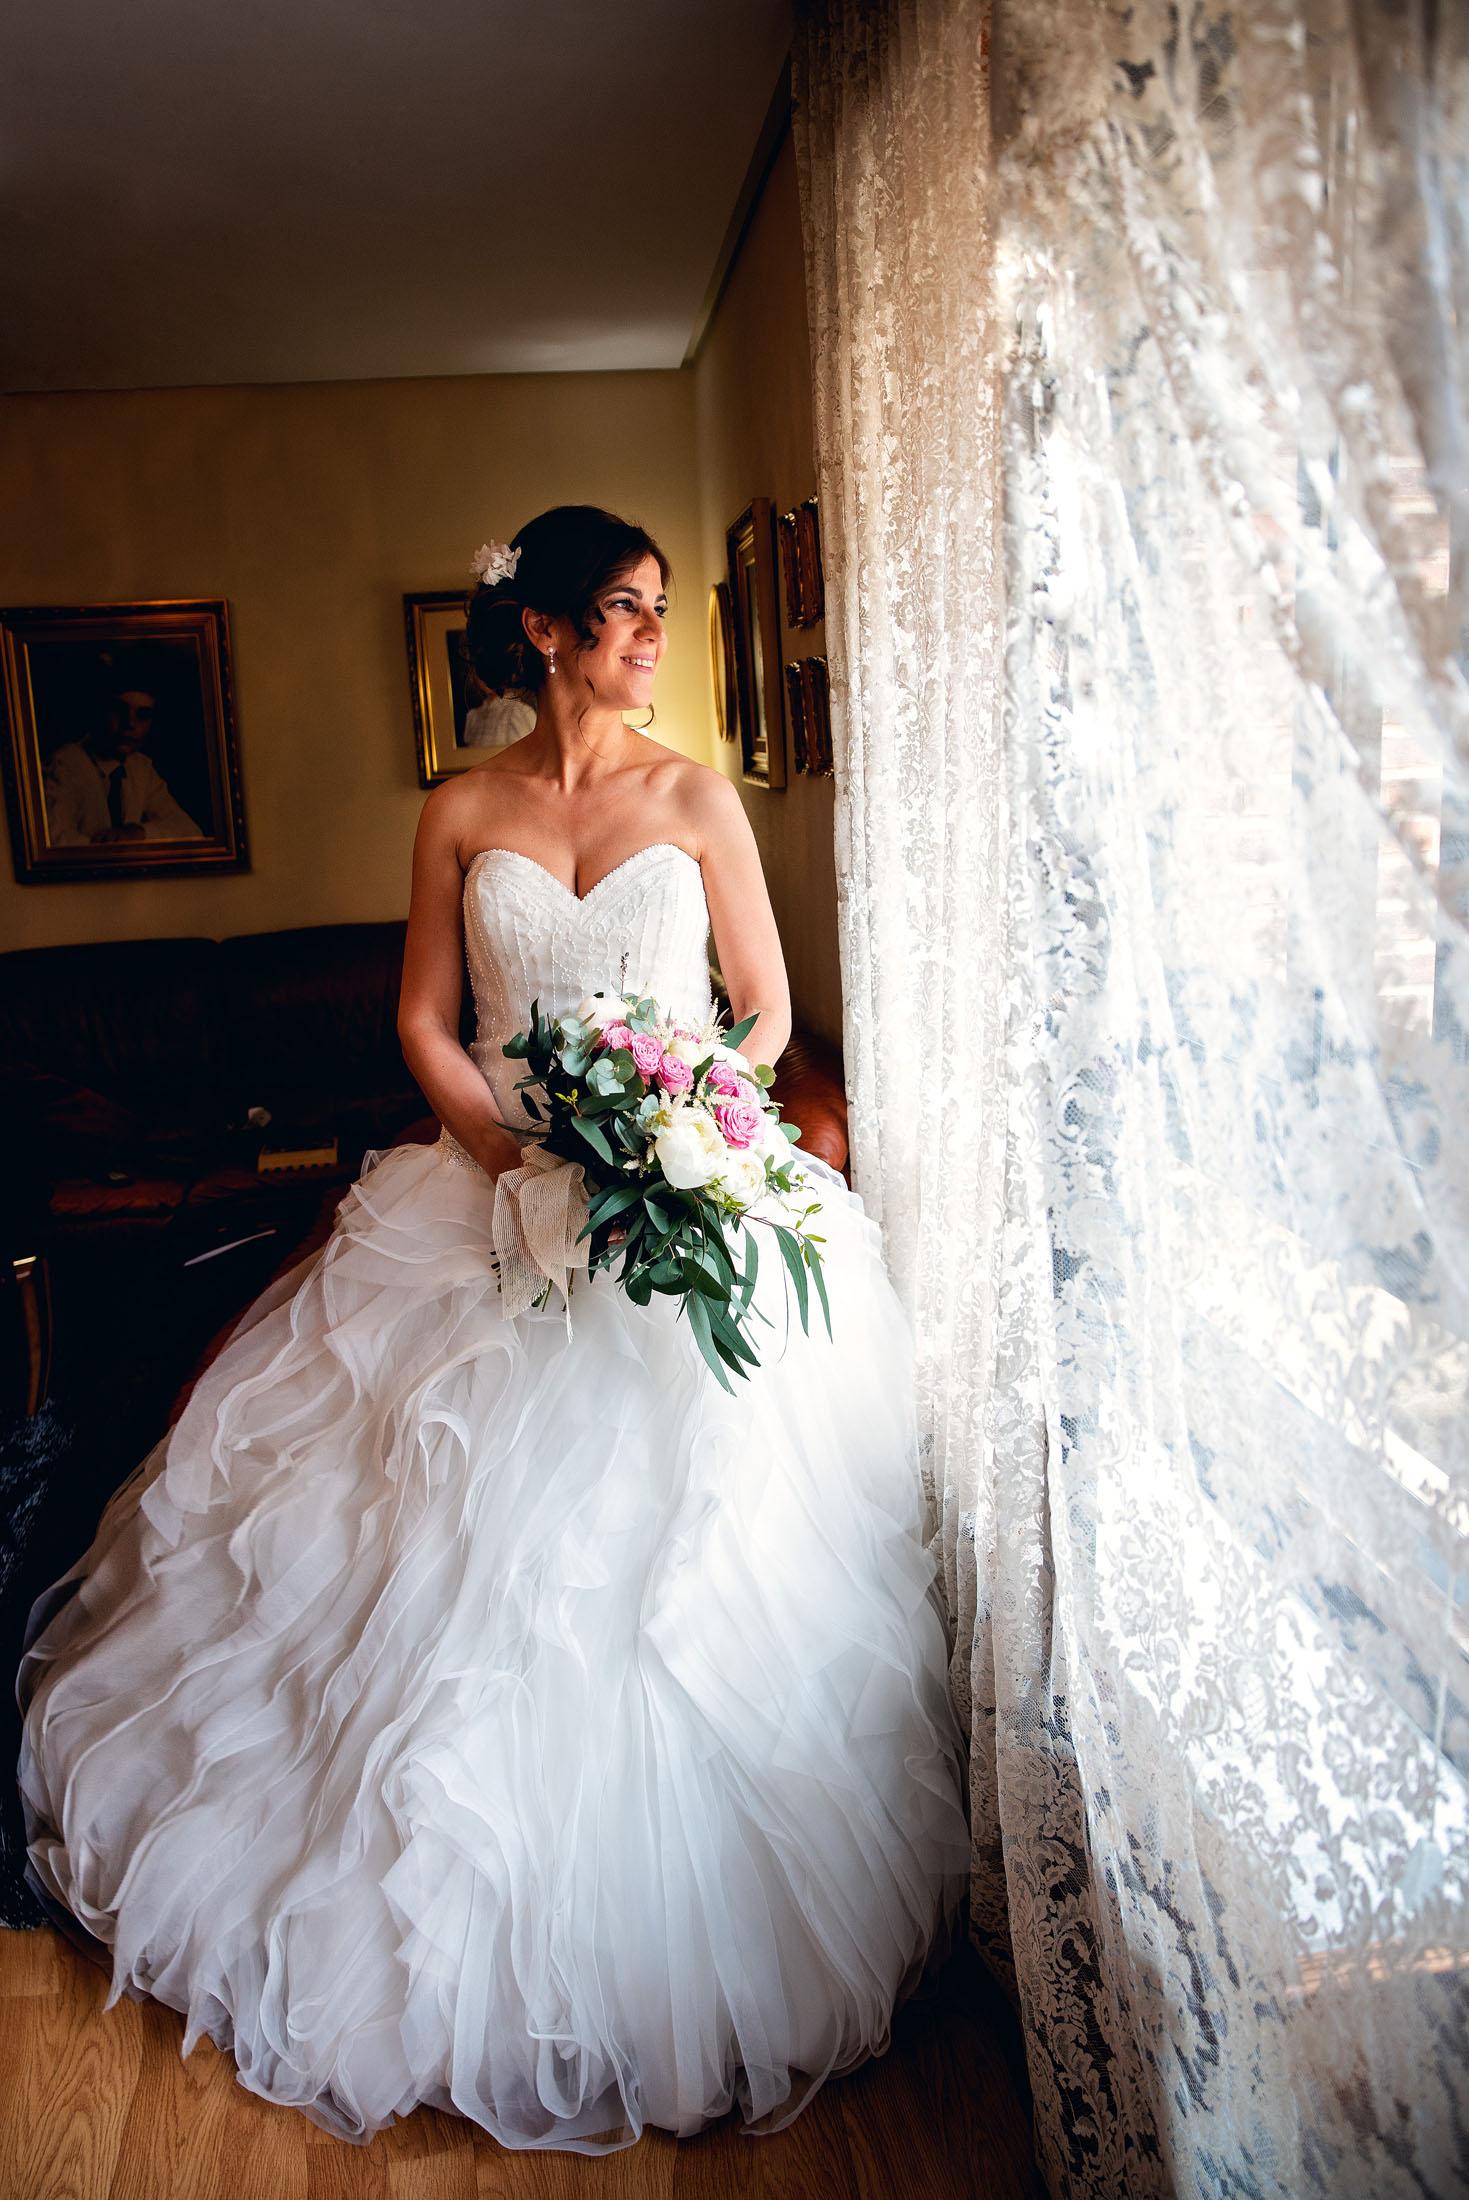 Fotografo de bodas Albacete